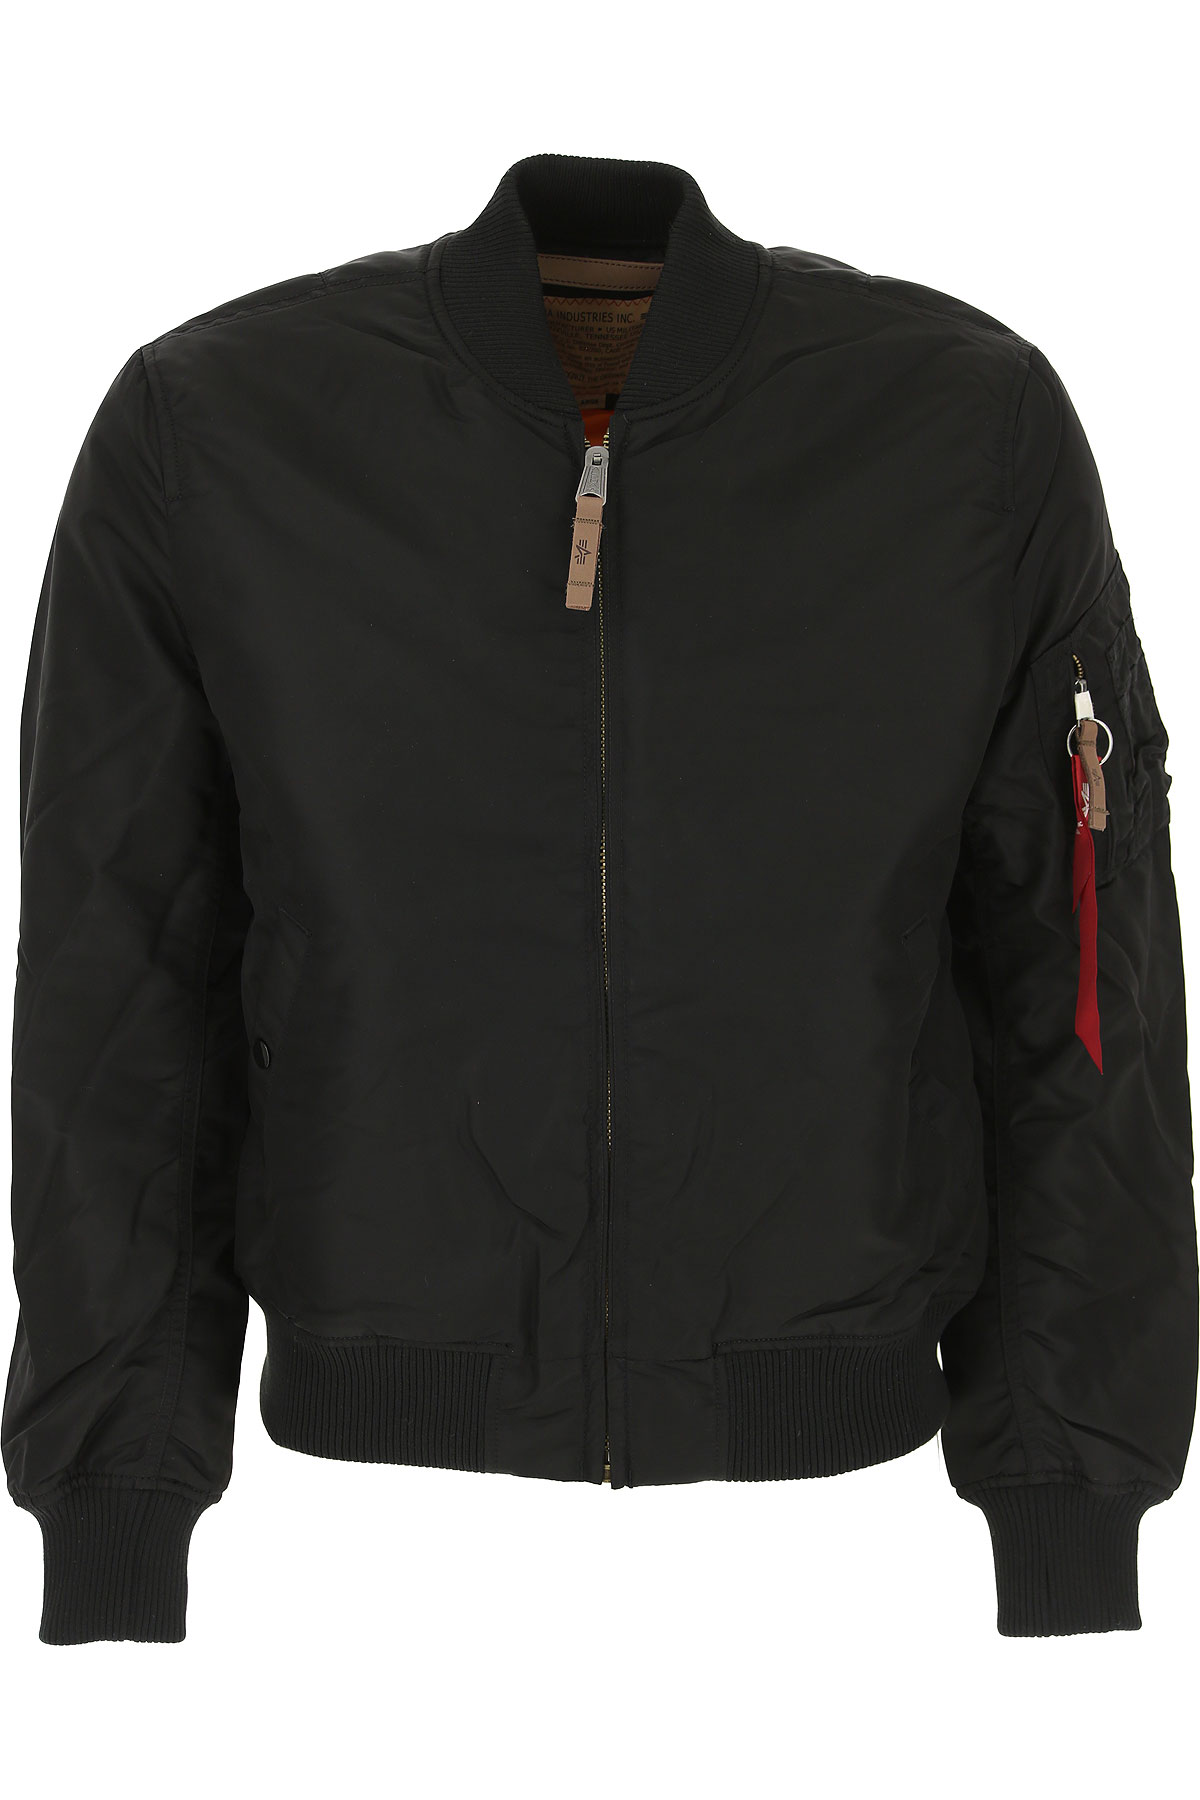 Image of Alpha Industries Jacket for Men, Black, Nylon, 2017, L M S XL XXL